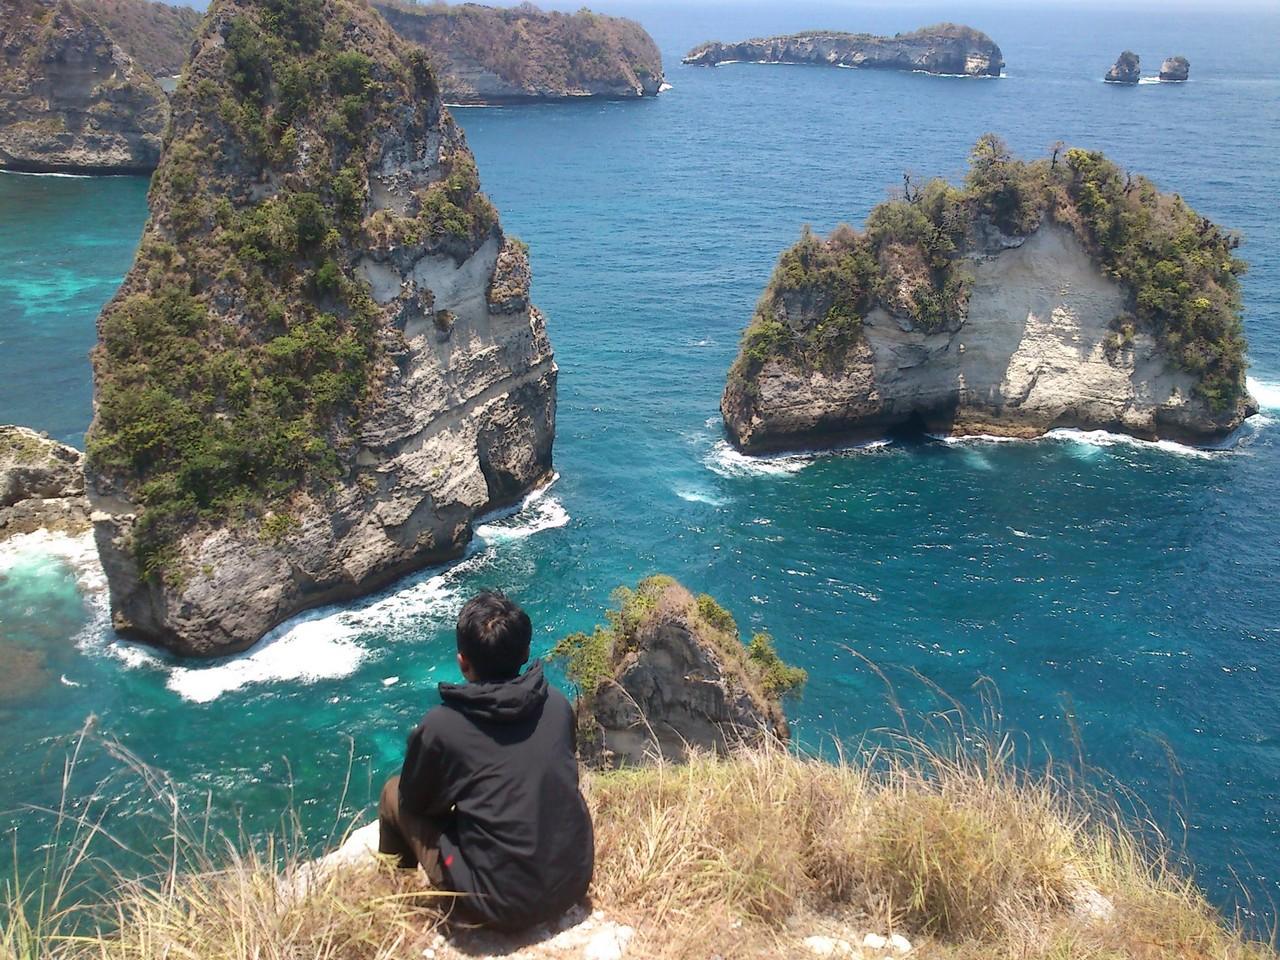 Ini Mah Bukan Rajaampat Atuh Nusa Penida Rizaltaf Com